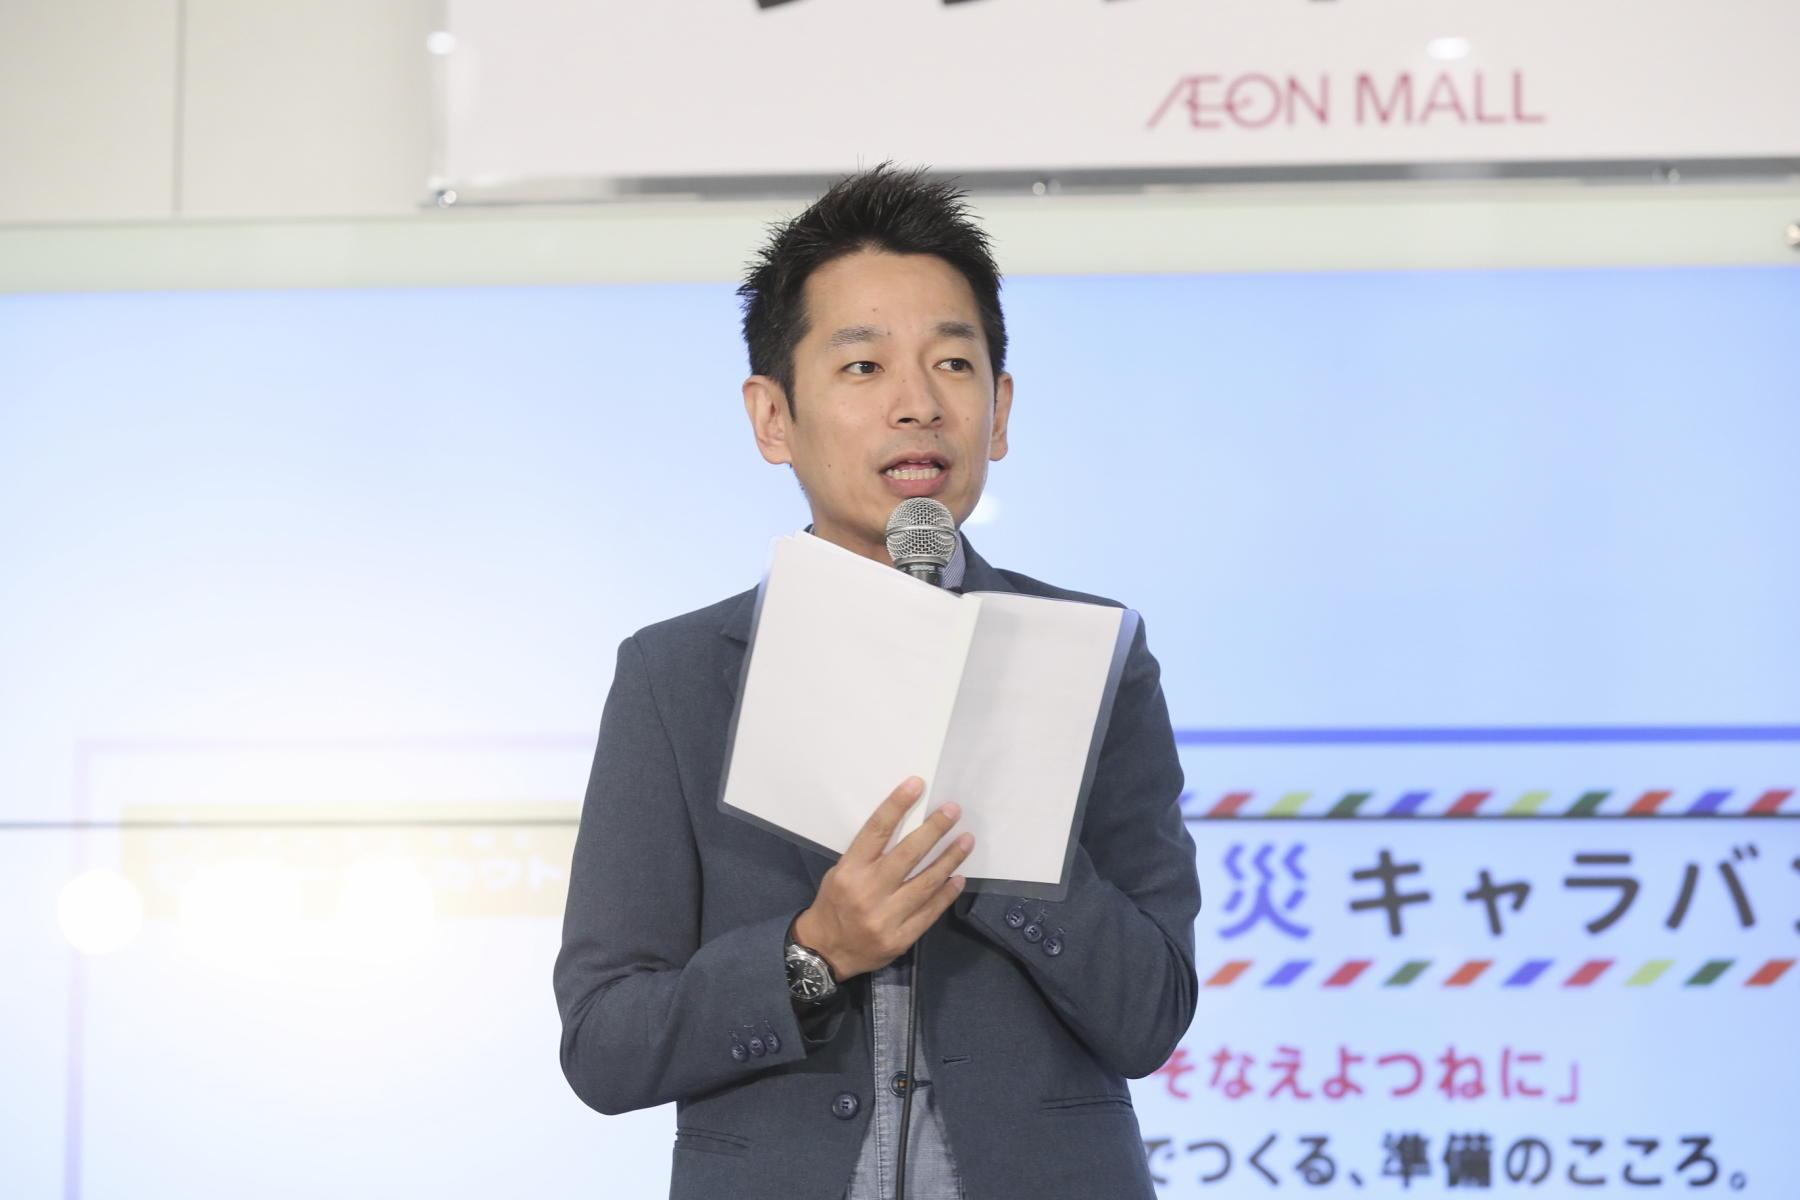 http://news.yoshimoto.co.jp/20180830173639-39e634efa0a817c850ffc8338db666693547d3a5.jpg